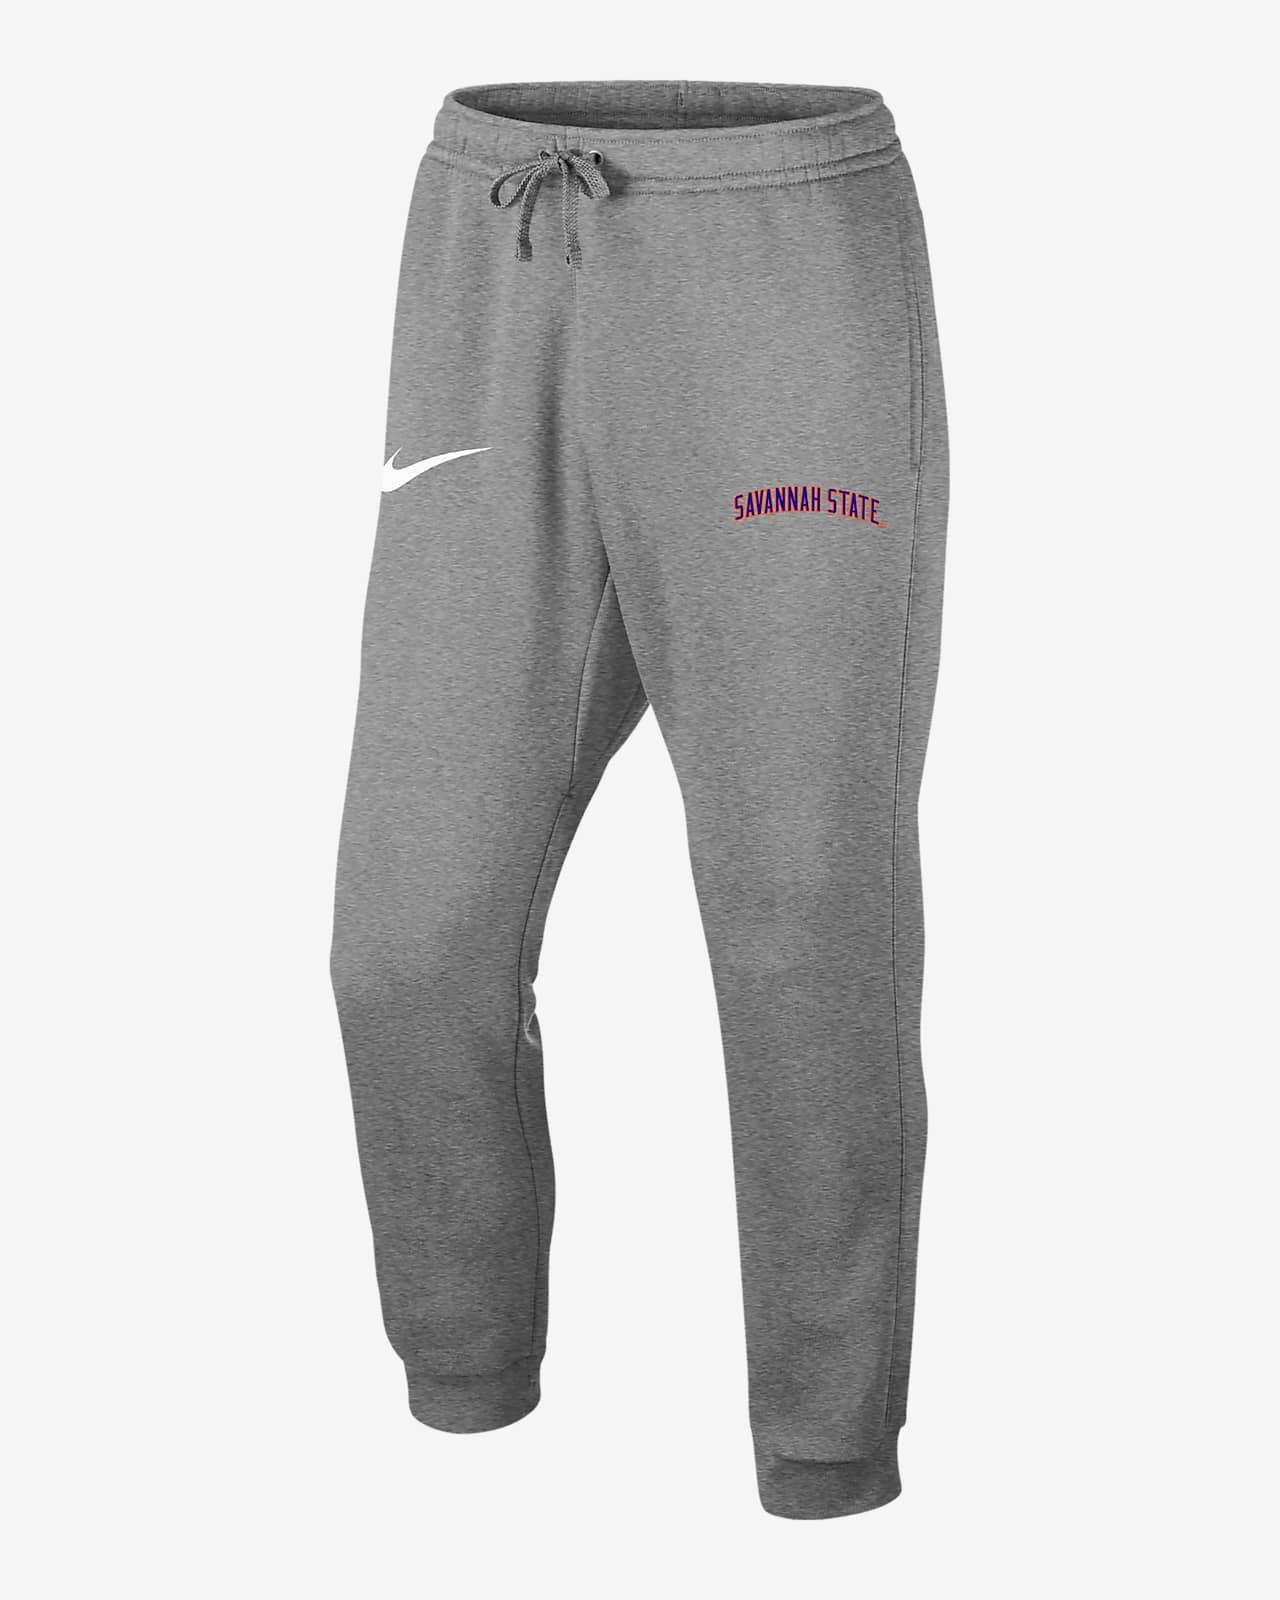 Nike College Club Fleece (Savannah State) Joggers